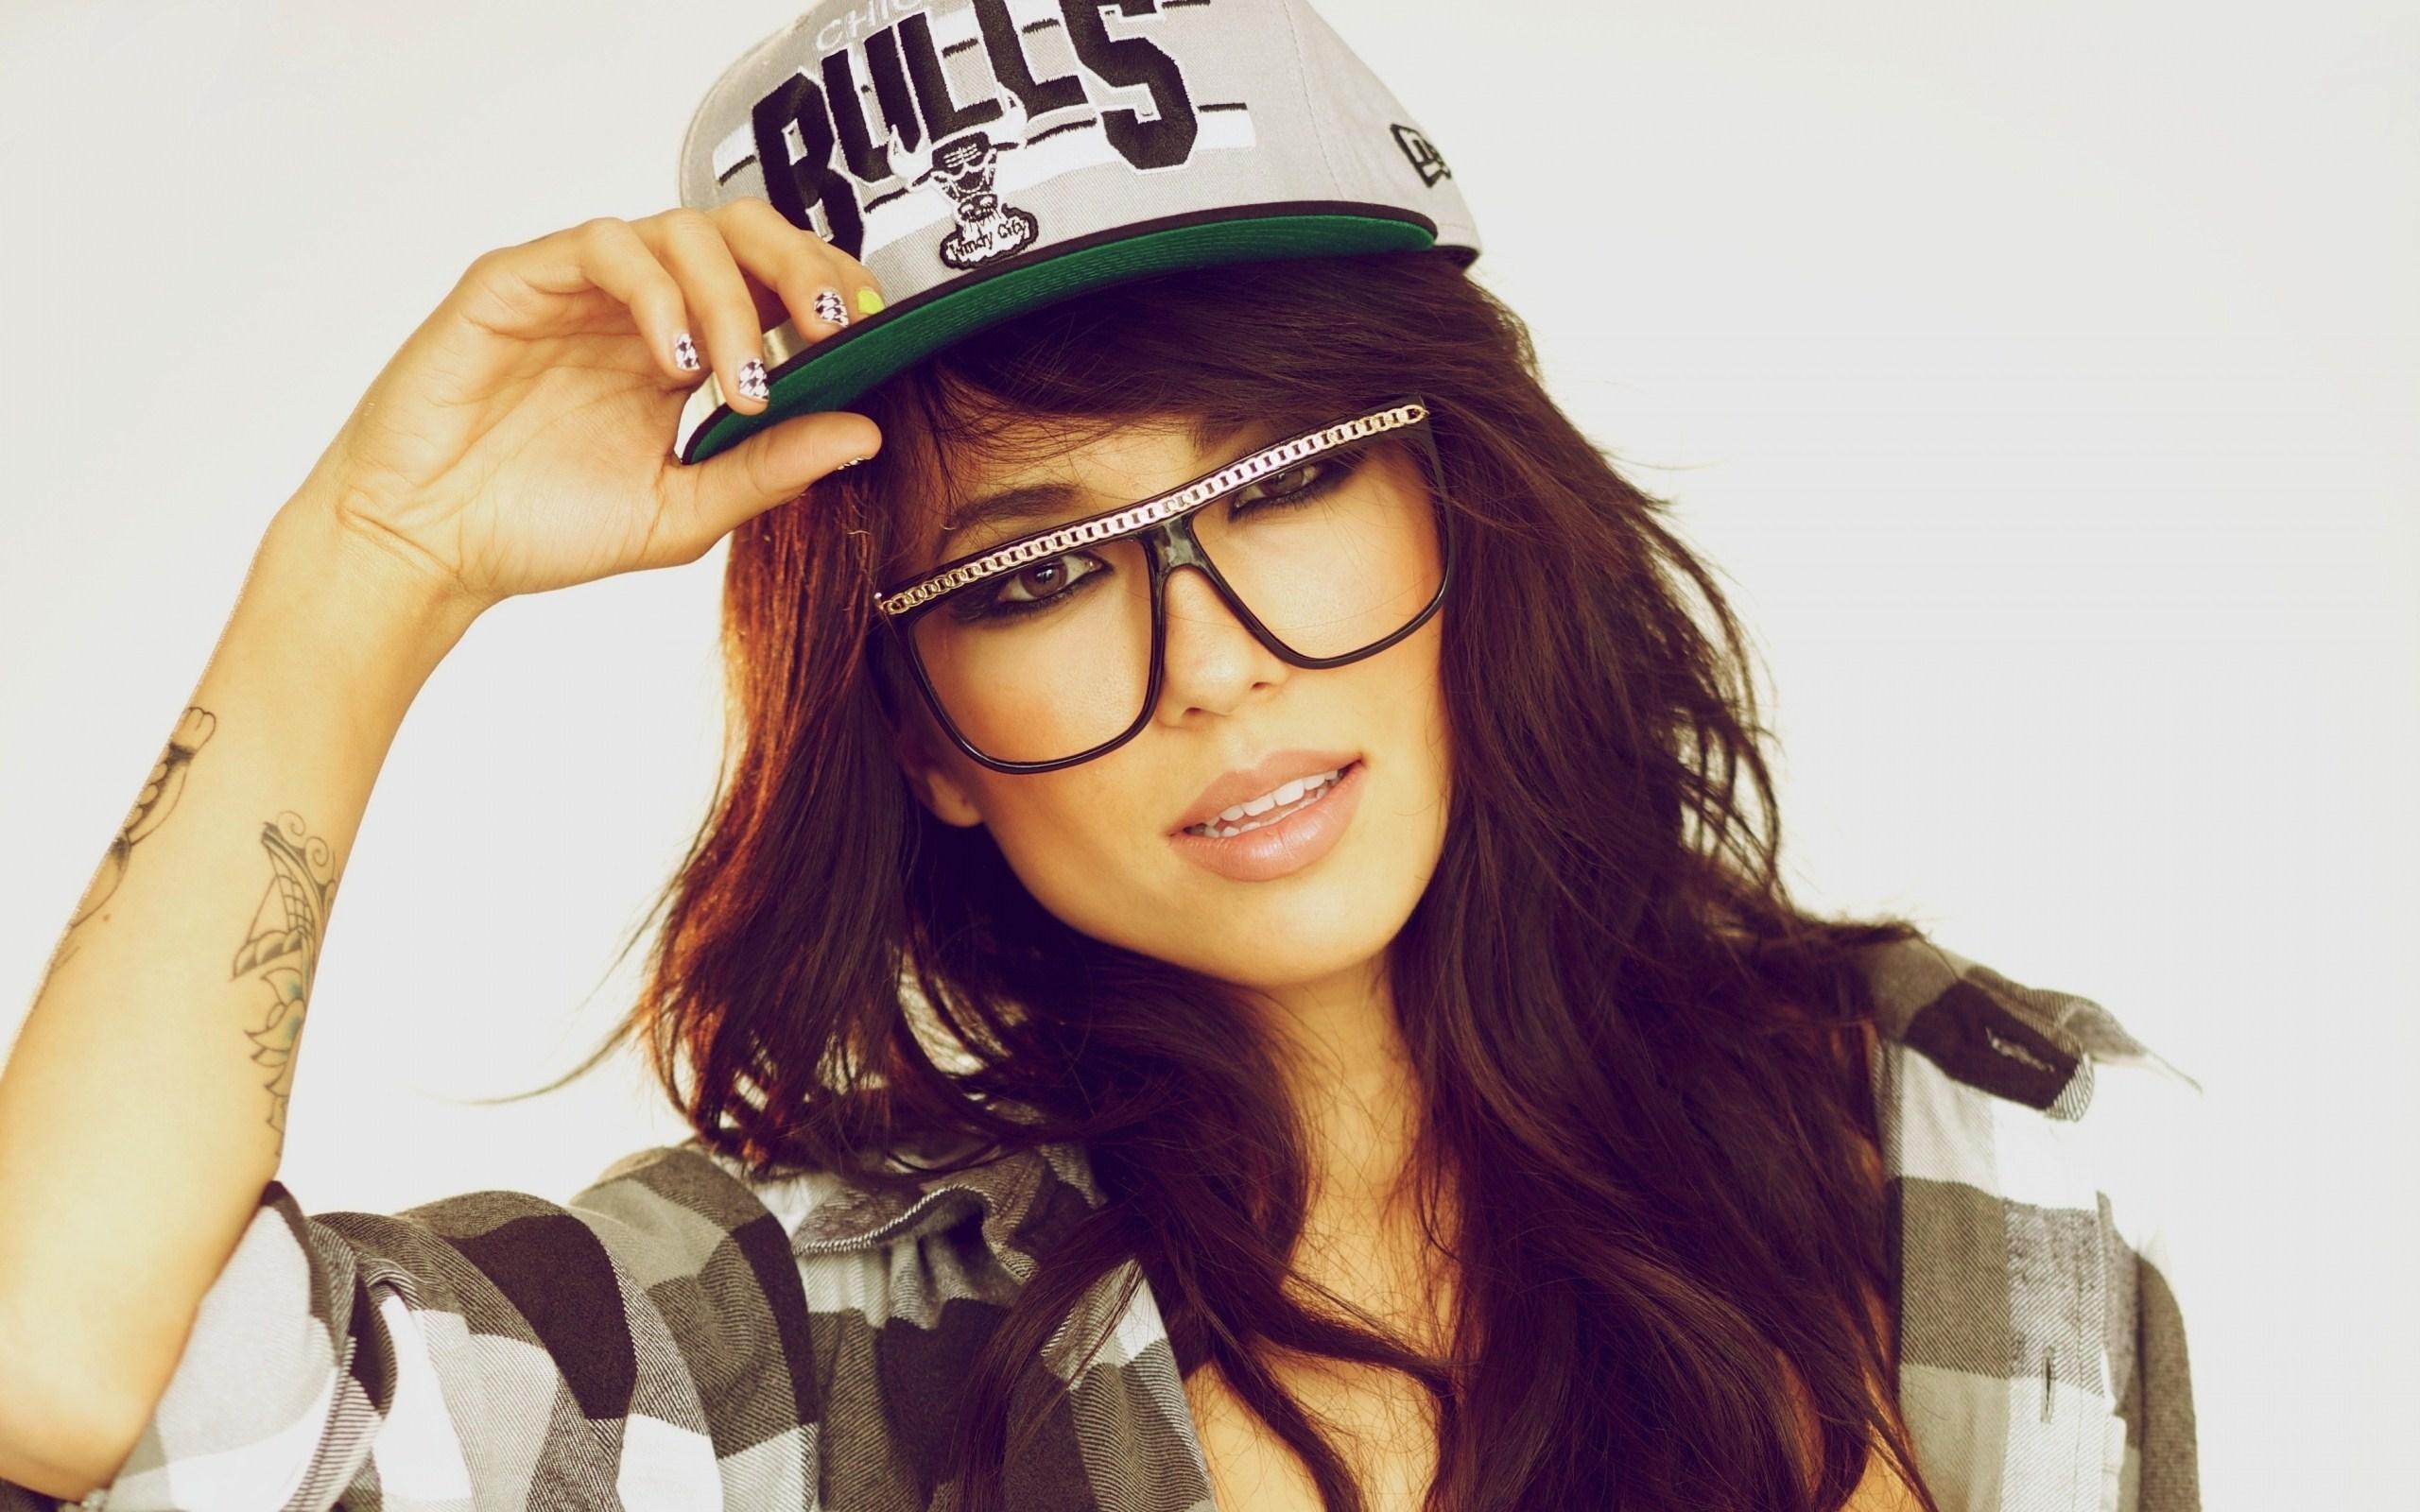 Alie Layus Girl Large Glasses Chicago Bulls Cap HD Wallpaper